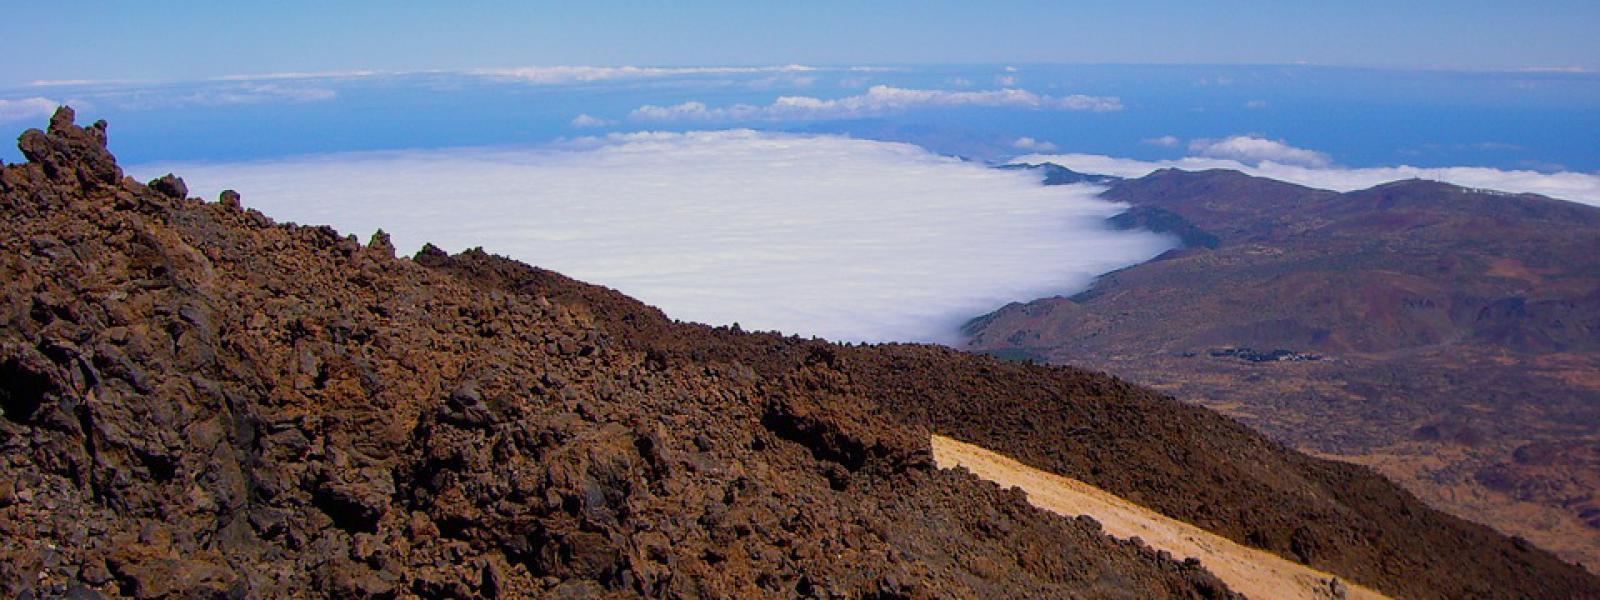 Tenerife - Pico del teide